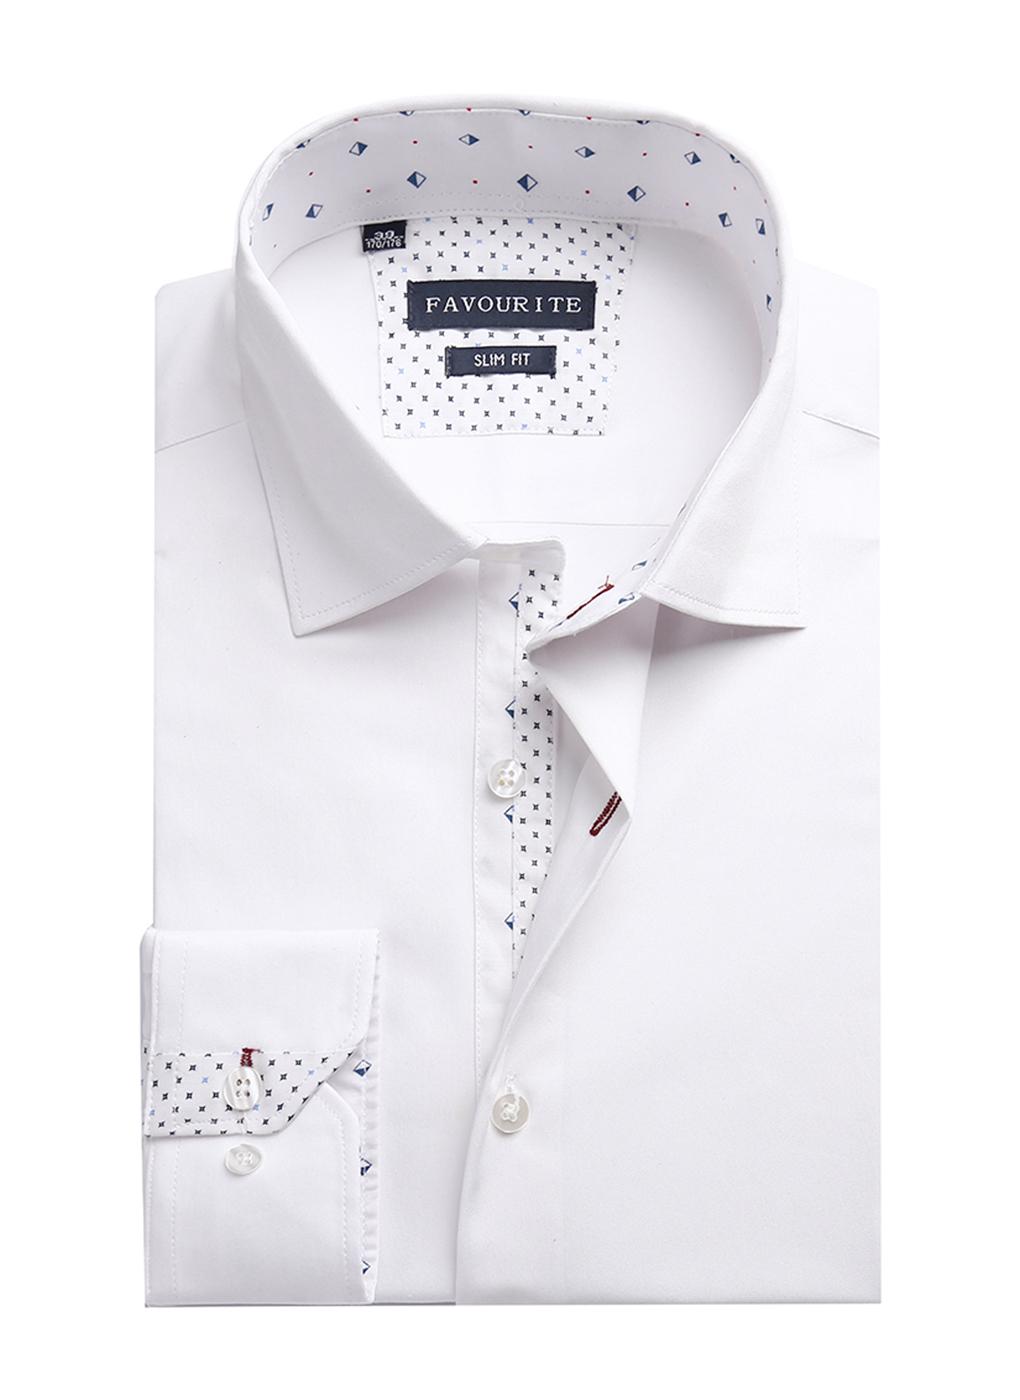 Рубашка мужская 17, Favourite фото